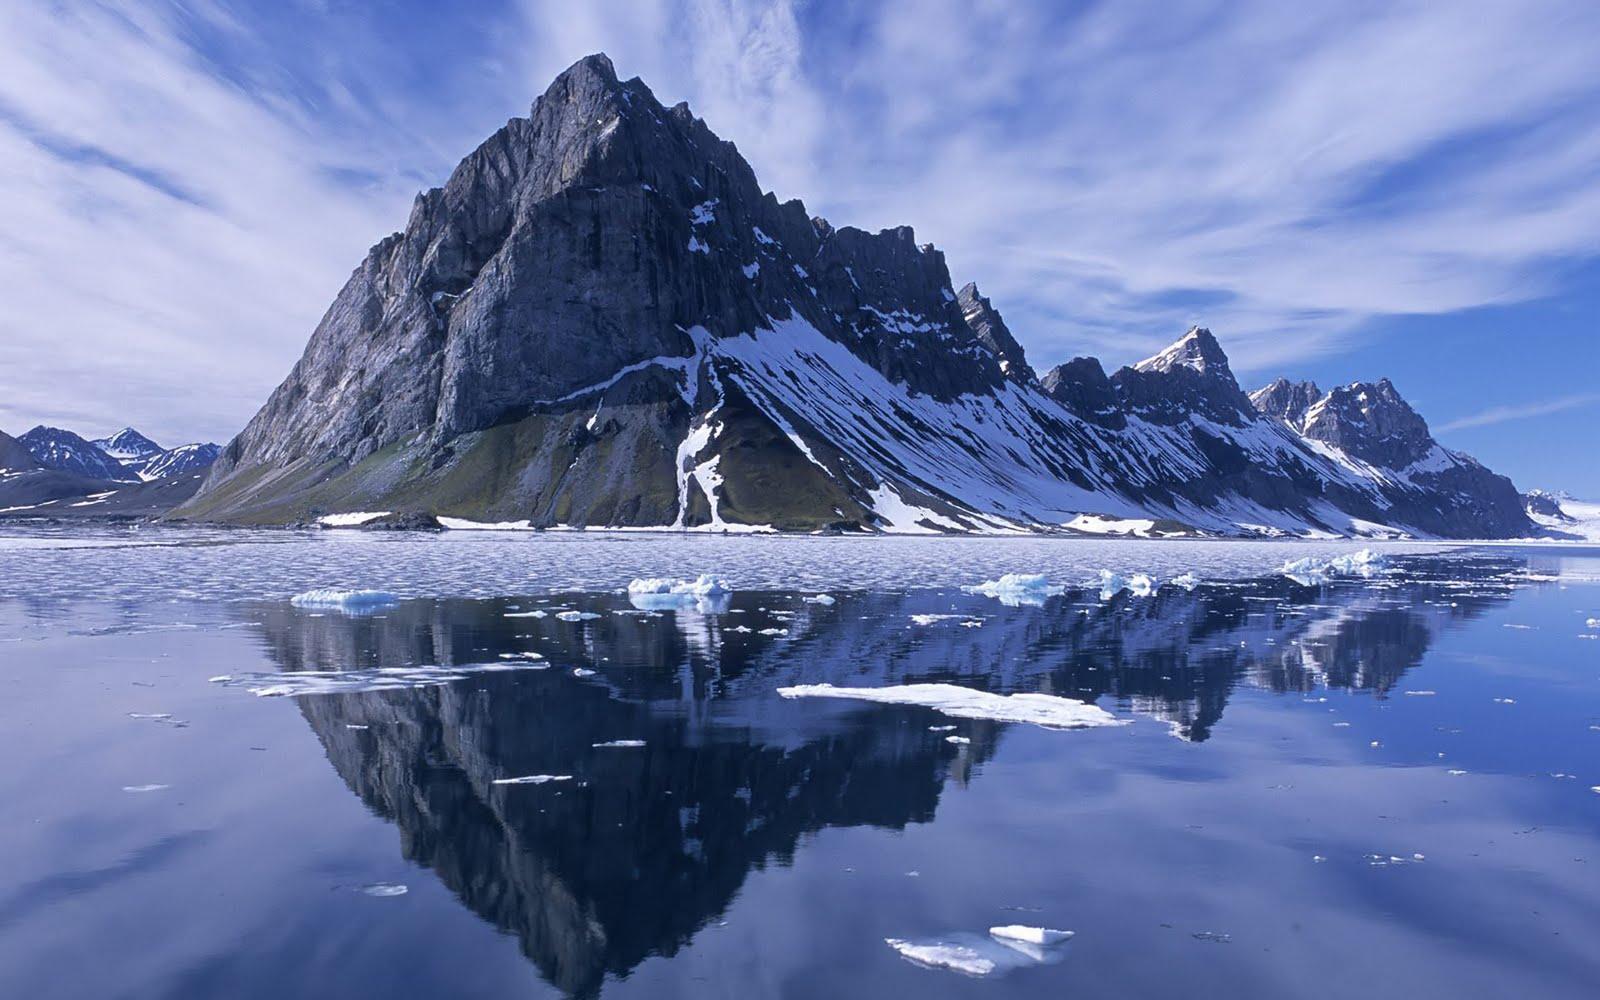 Norway Mountains hd wallpaper - Beauty O'v NaTuRe ....... !!!!!!!!